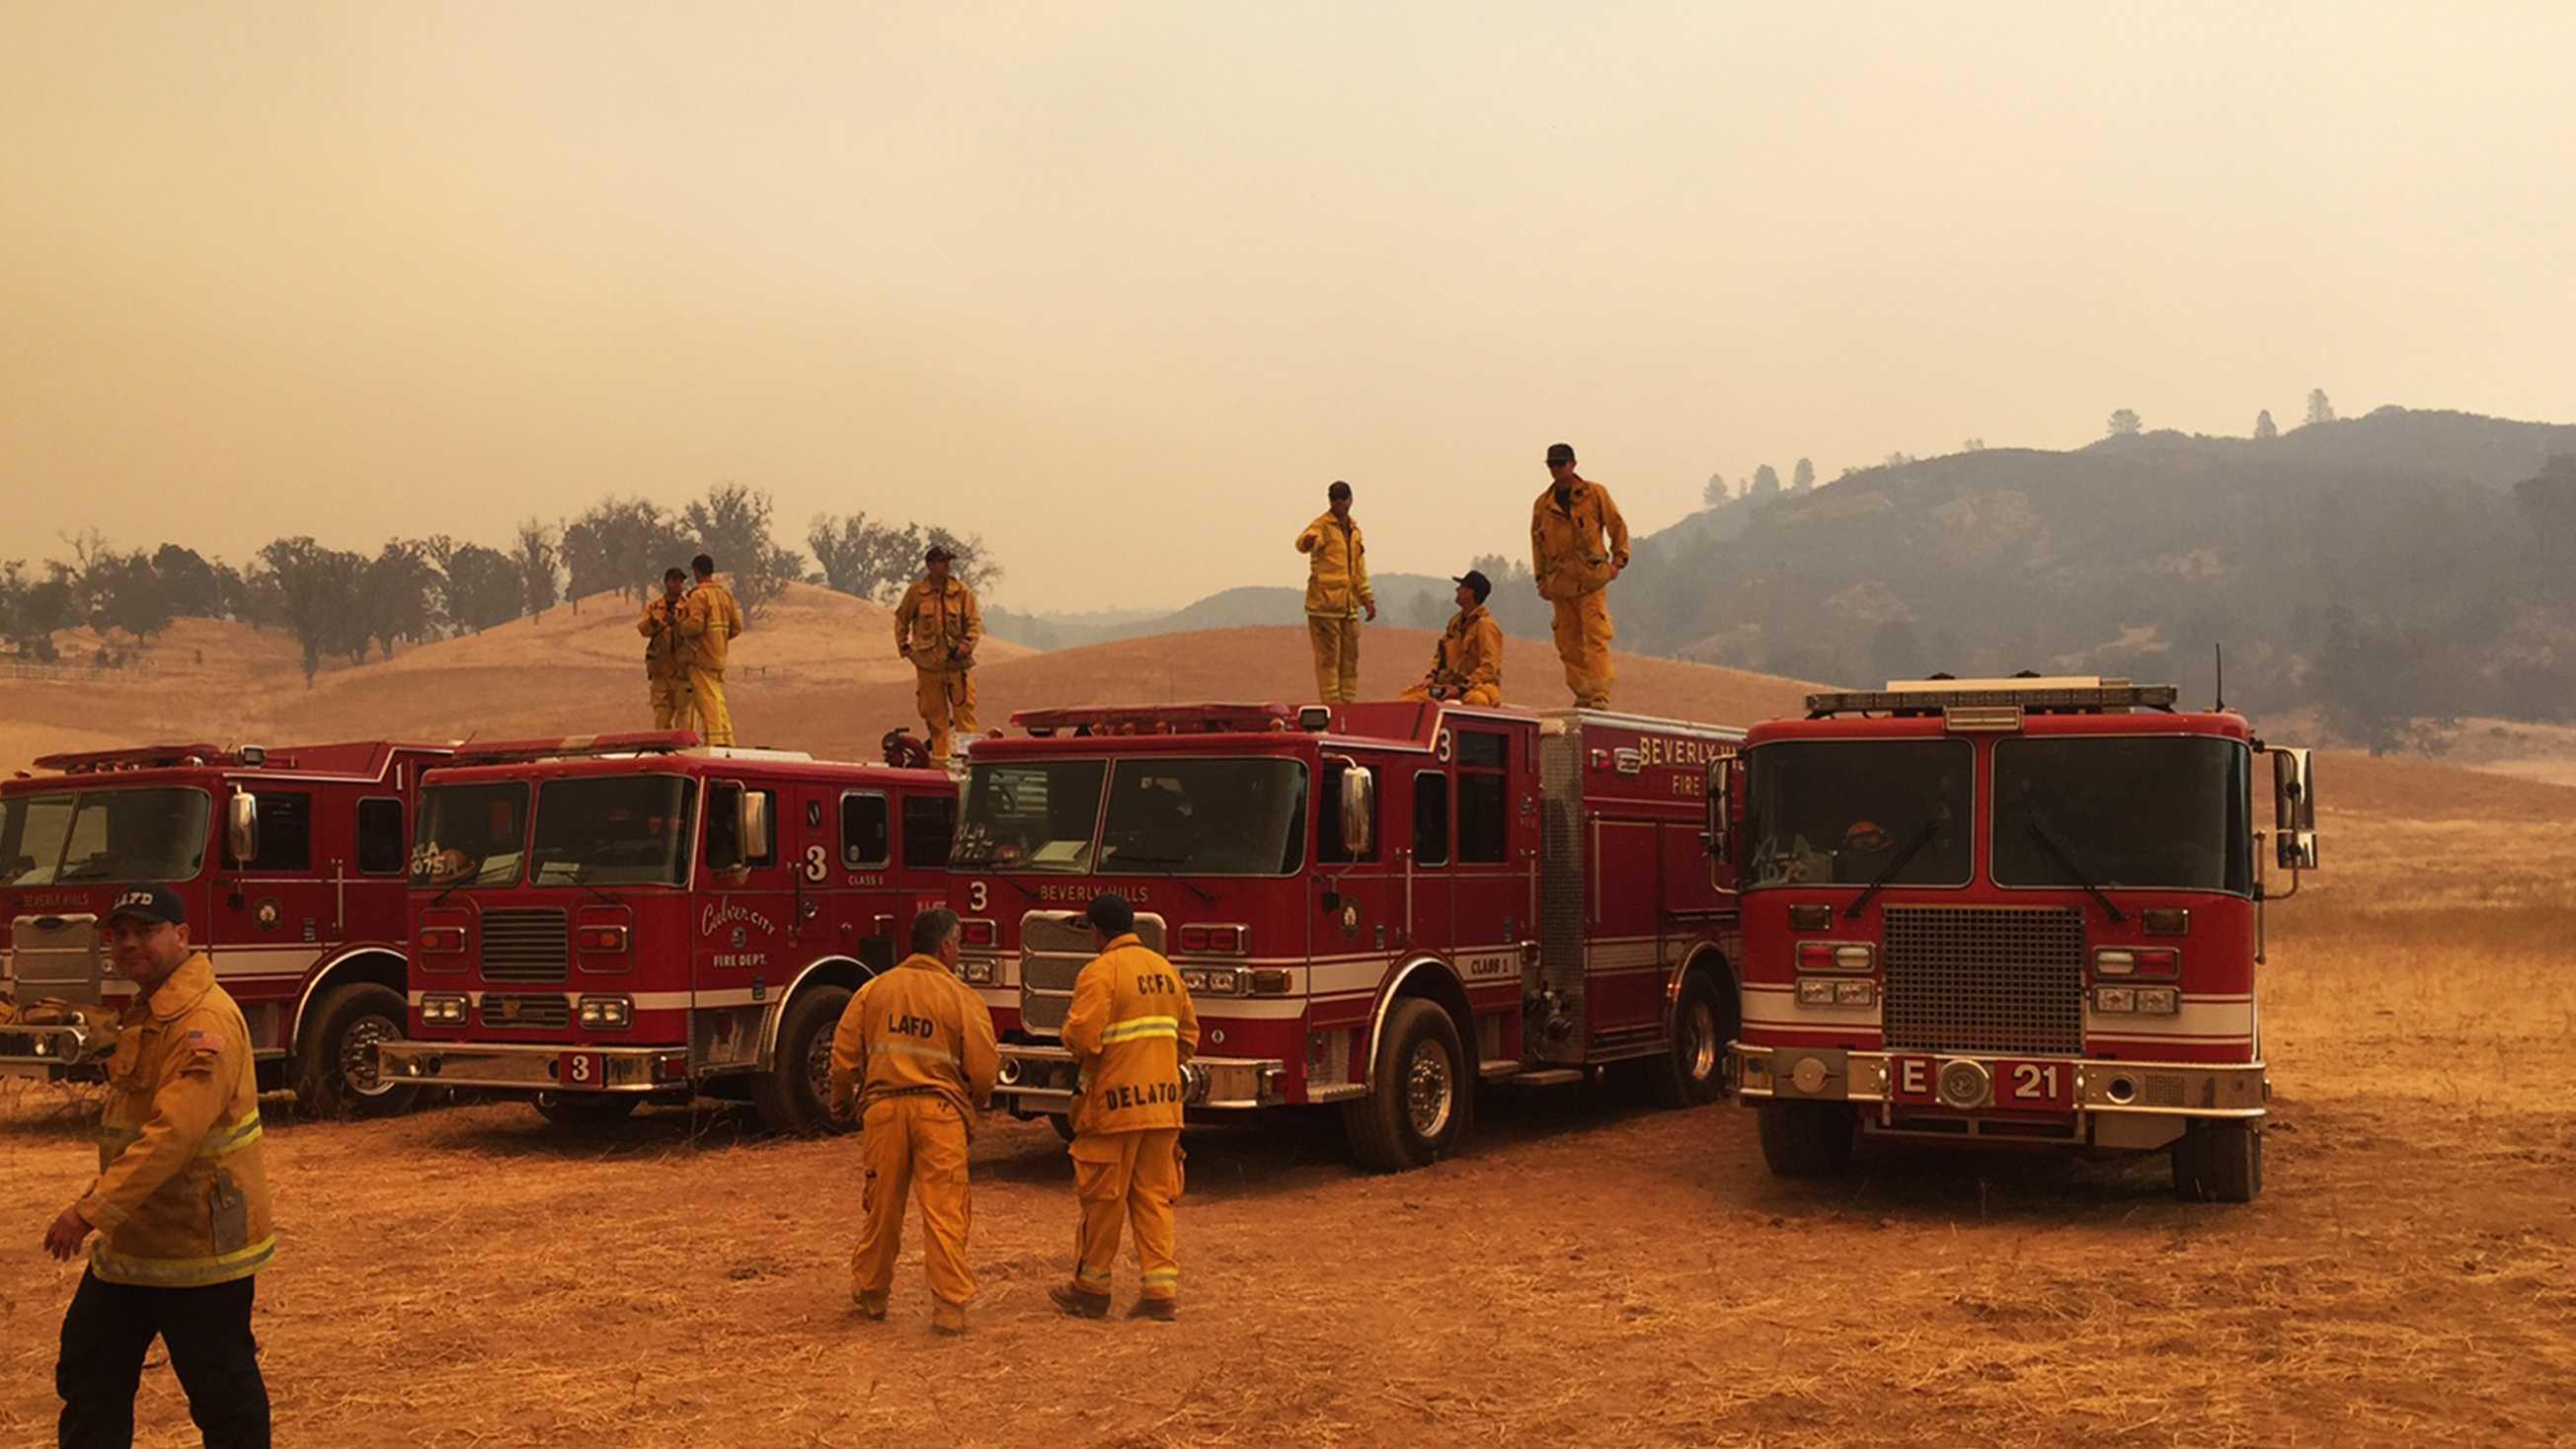 Chimney Fire firefighters